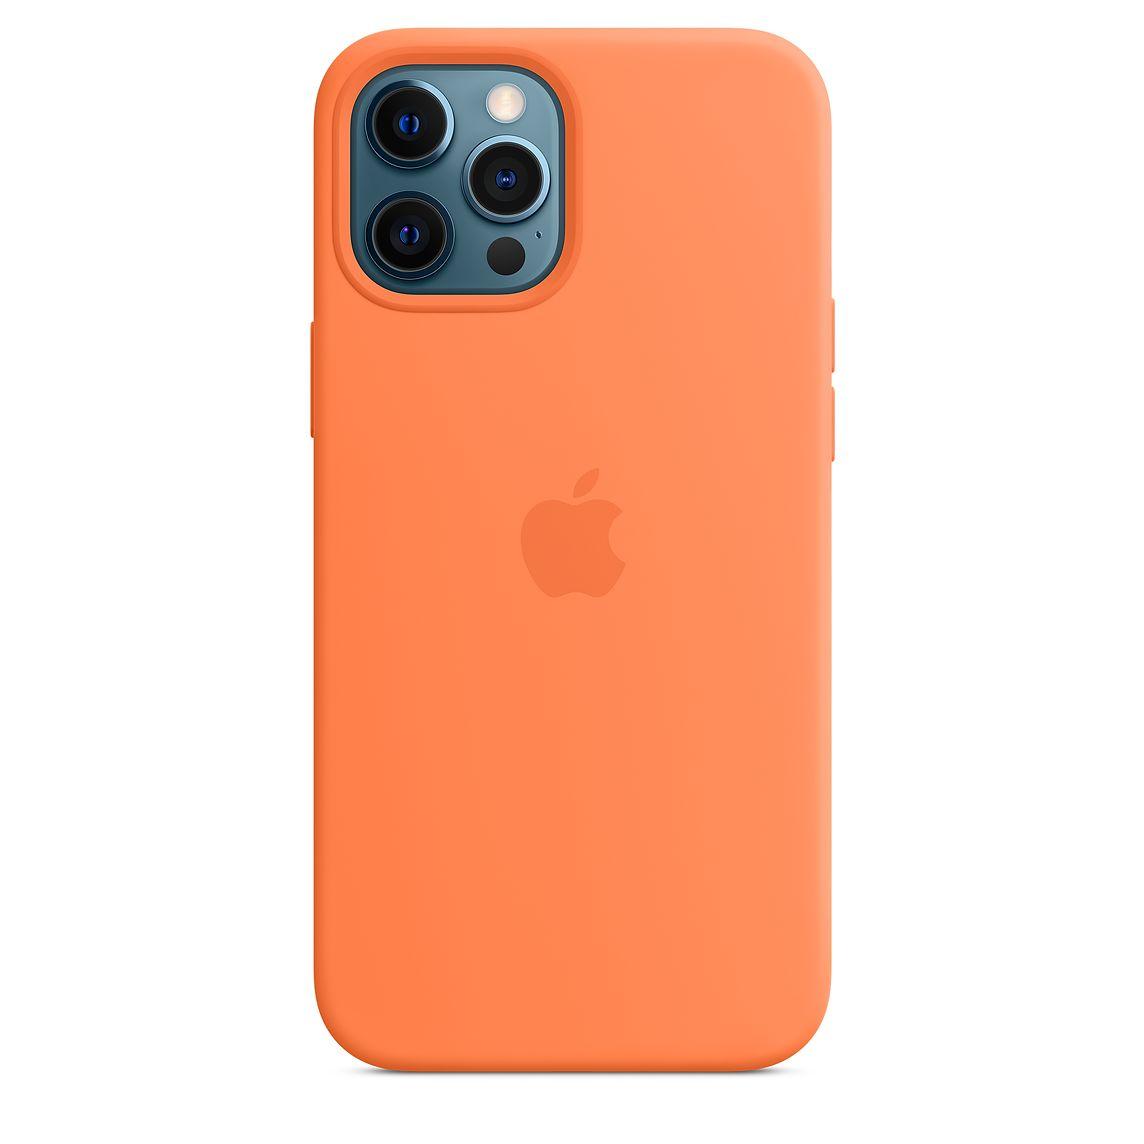 Apple iPhone 12 Pro Max Silicone Case with MagSafe Kumquat